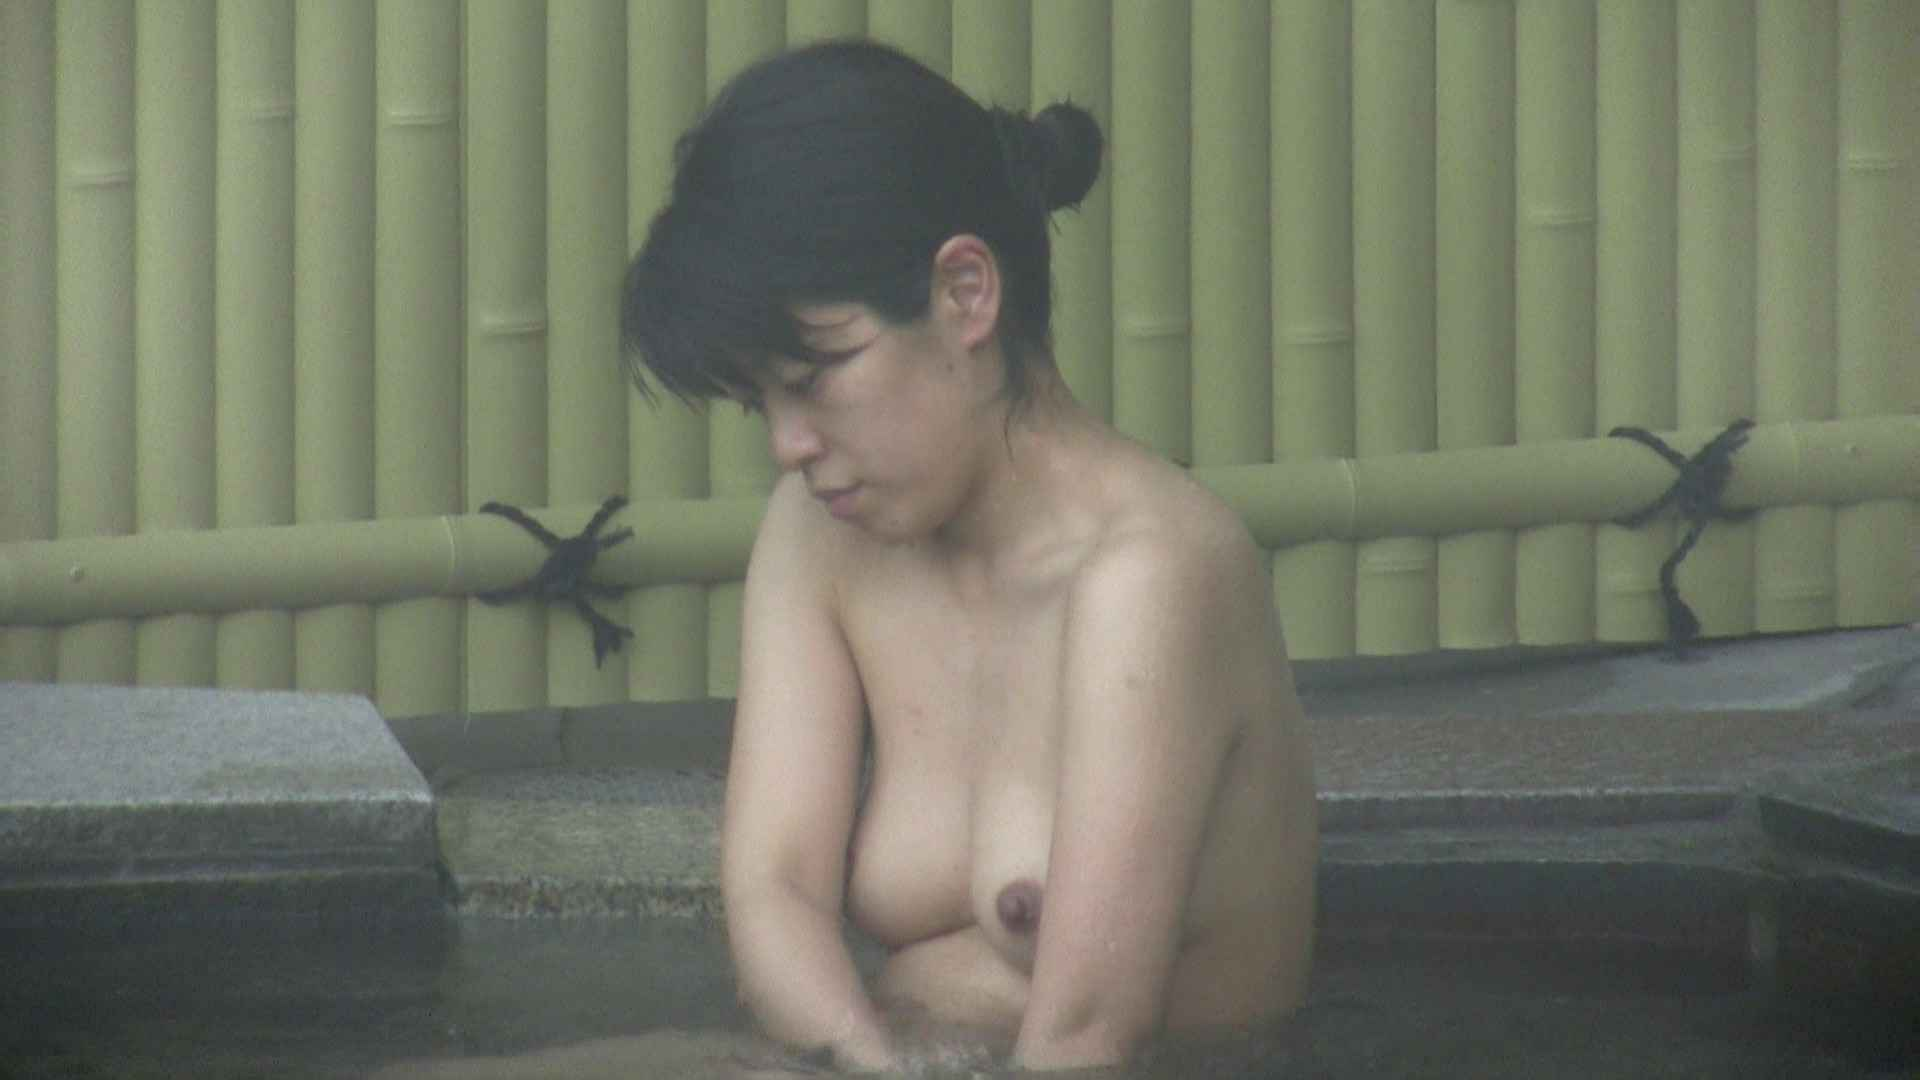 Aquaな露天風呂Vol.585 HなOL | 盗撮  93pic 66